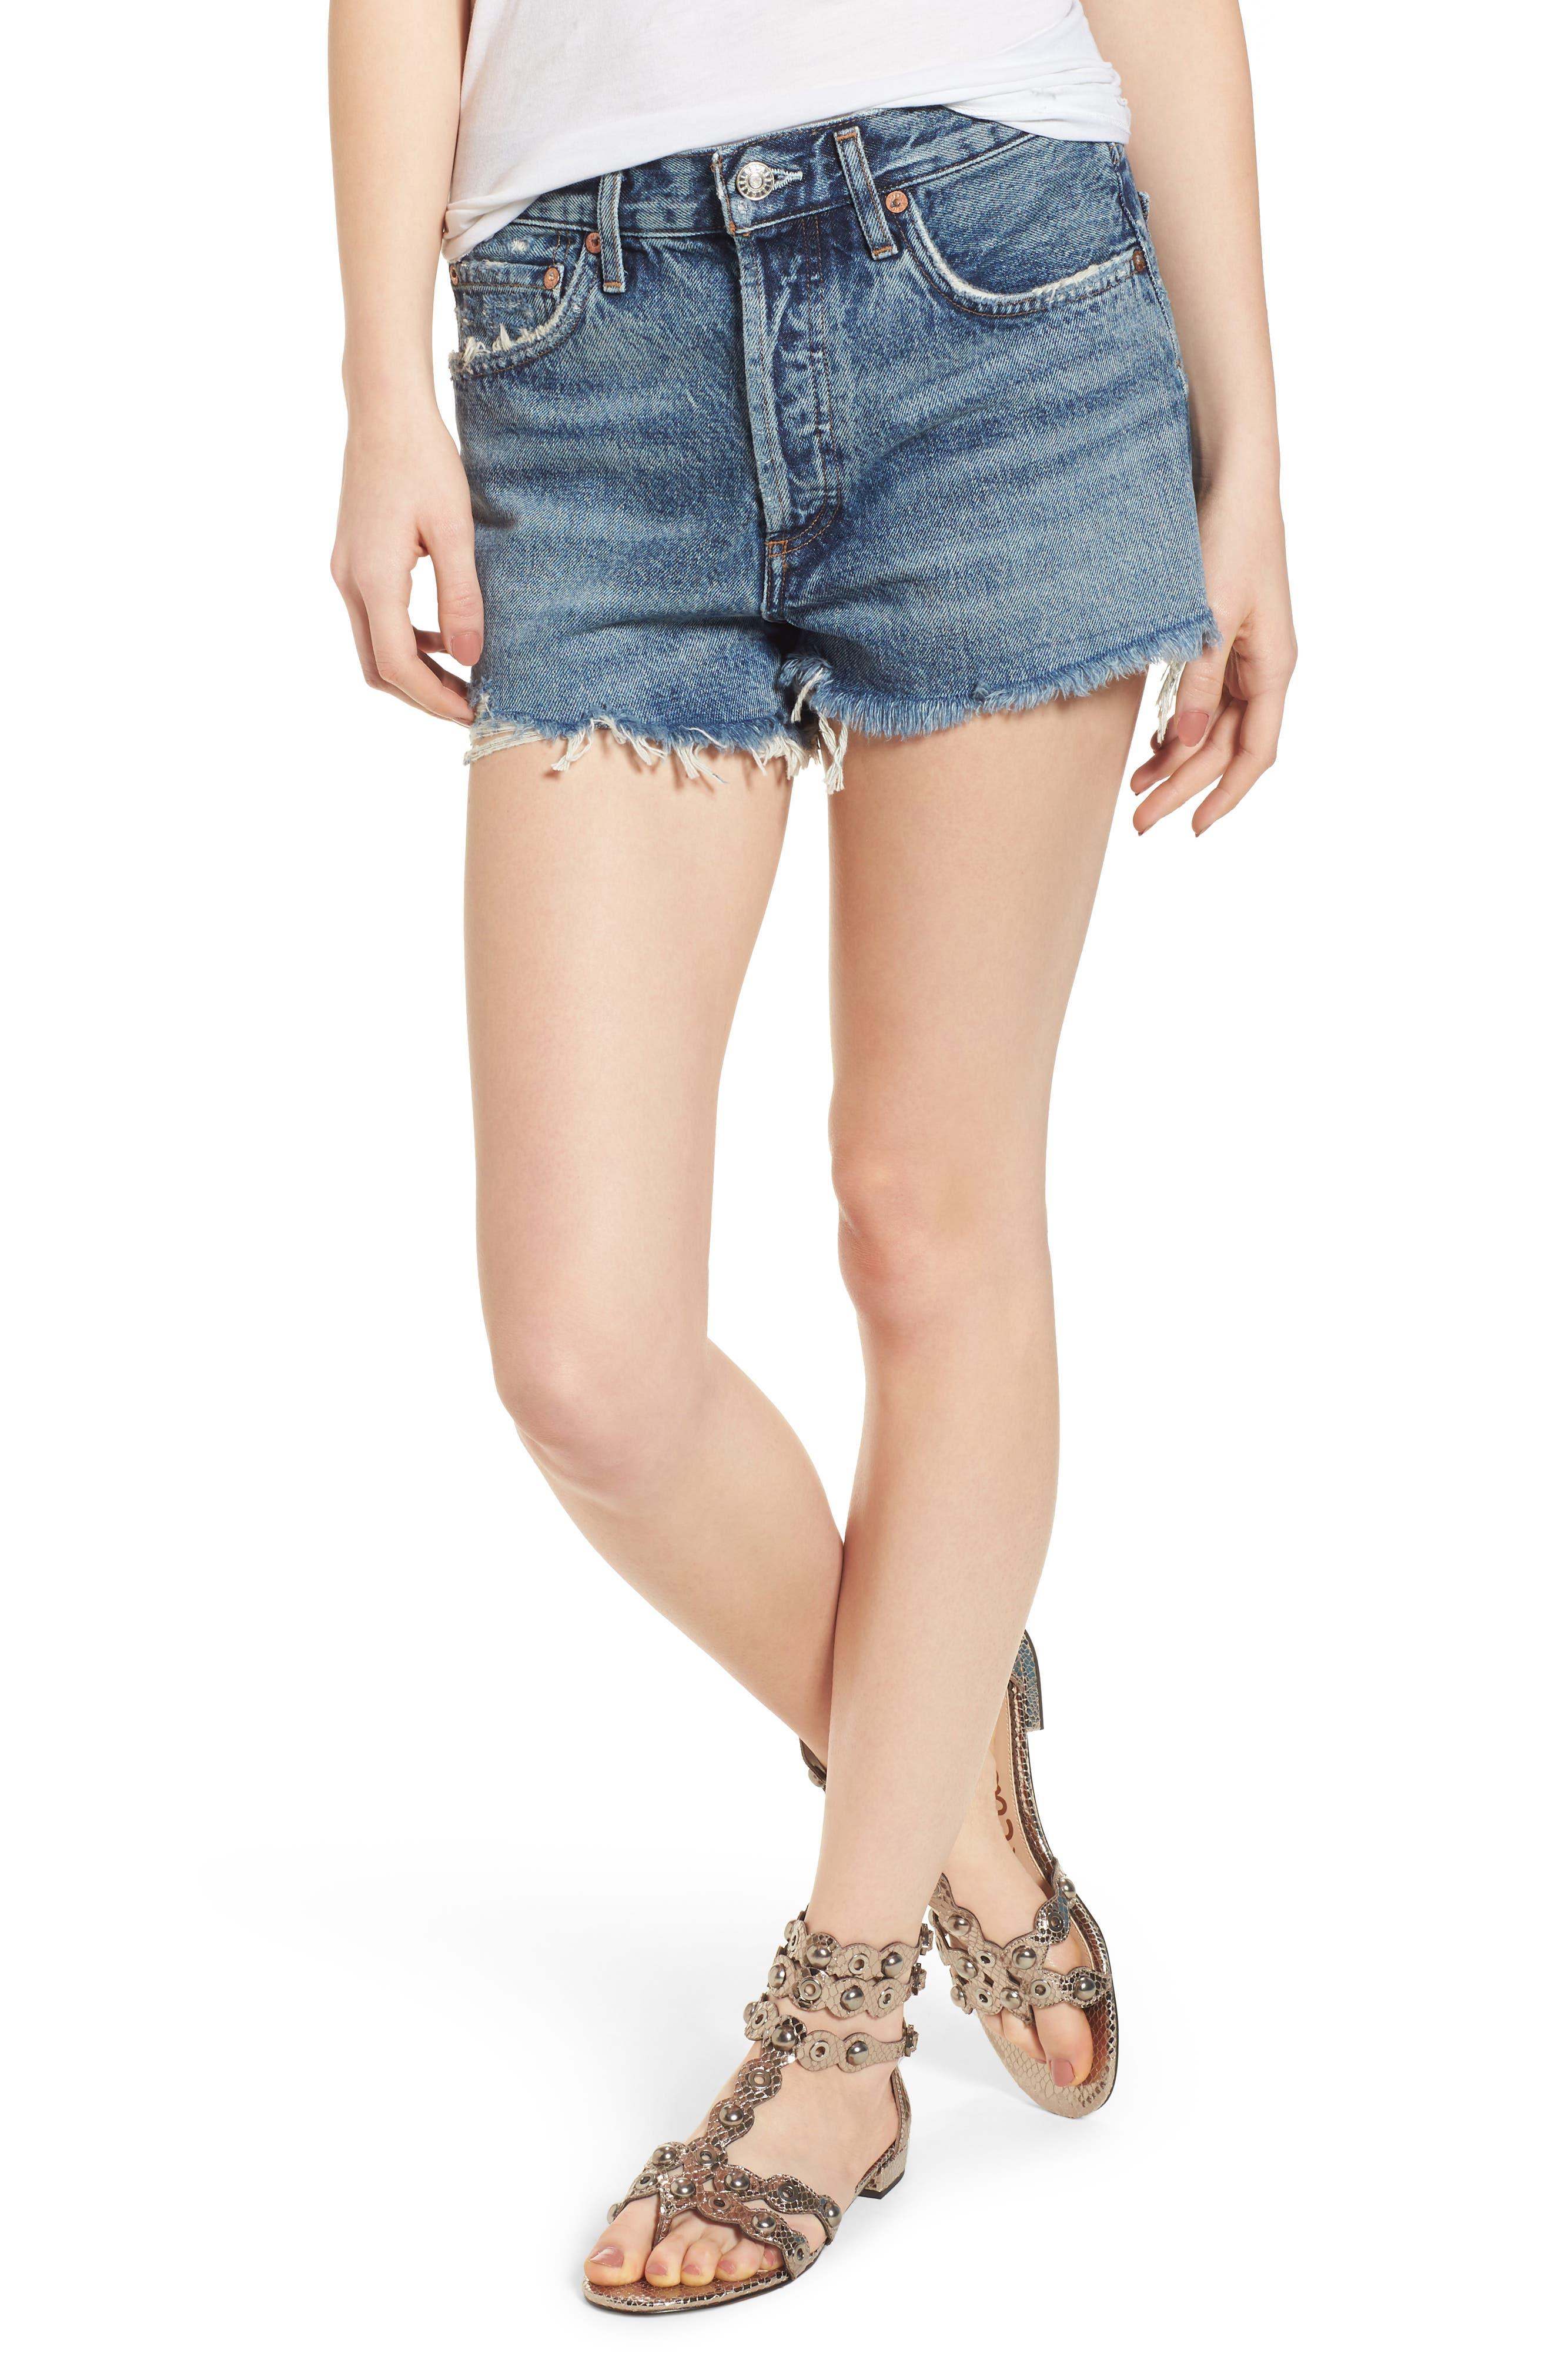 A GOLD E Parker Vintage Denim Cutoff Shorts in Rock Steady